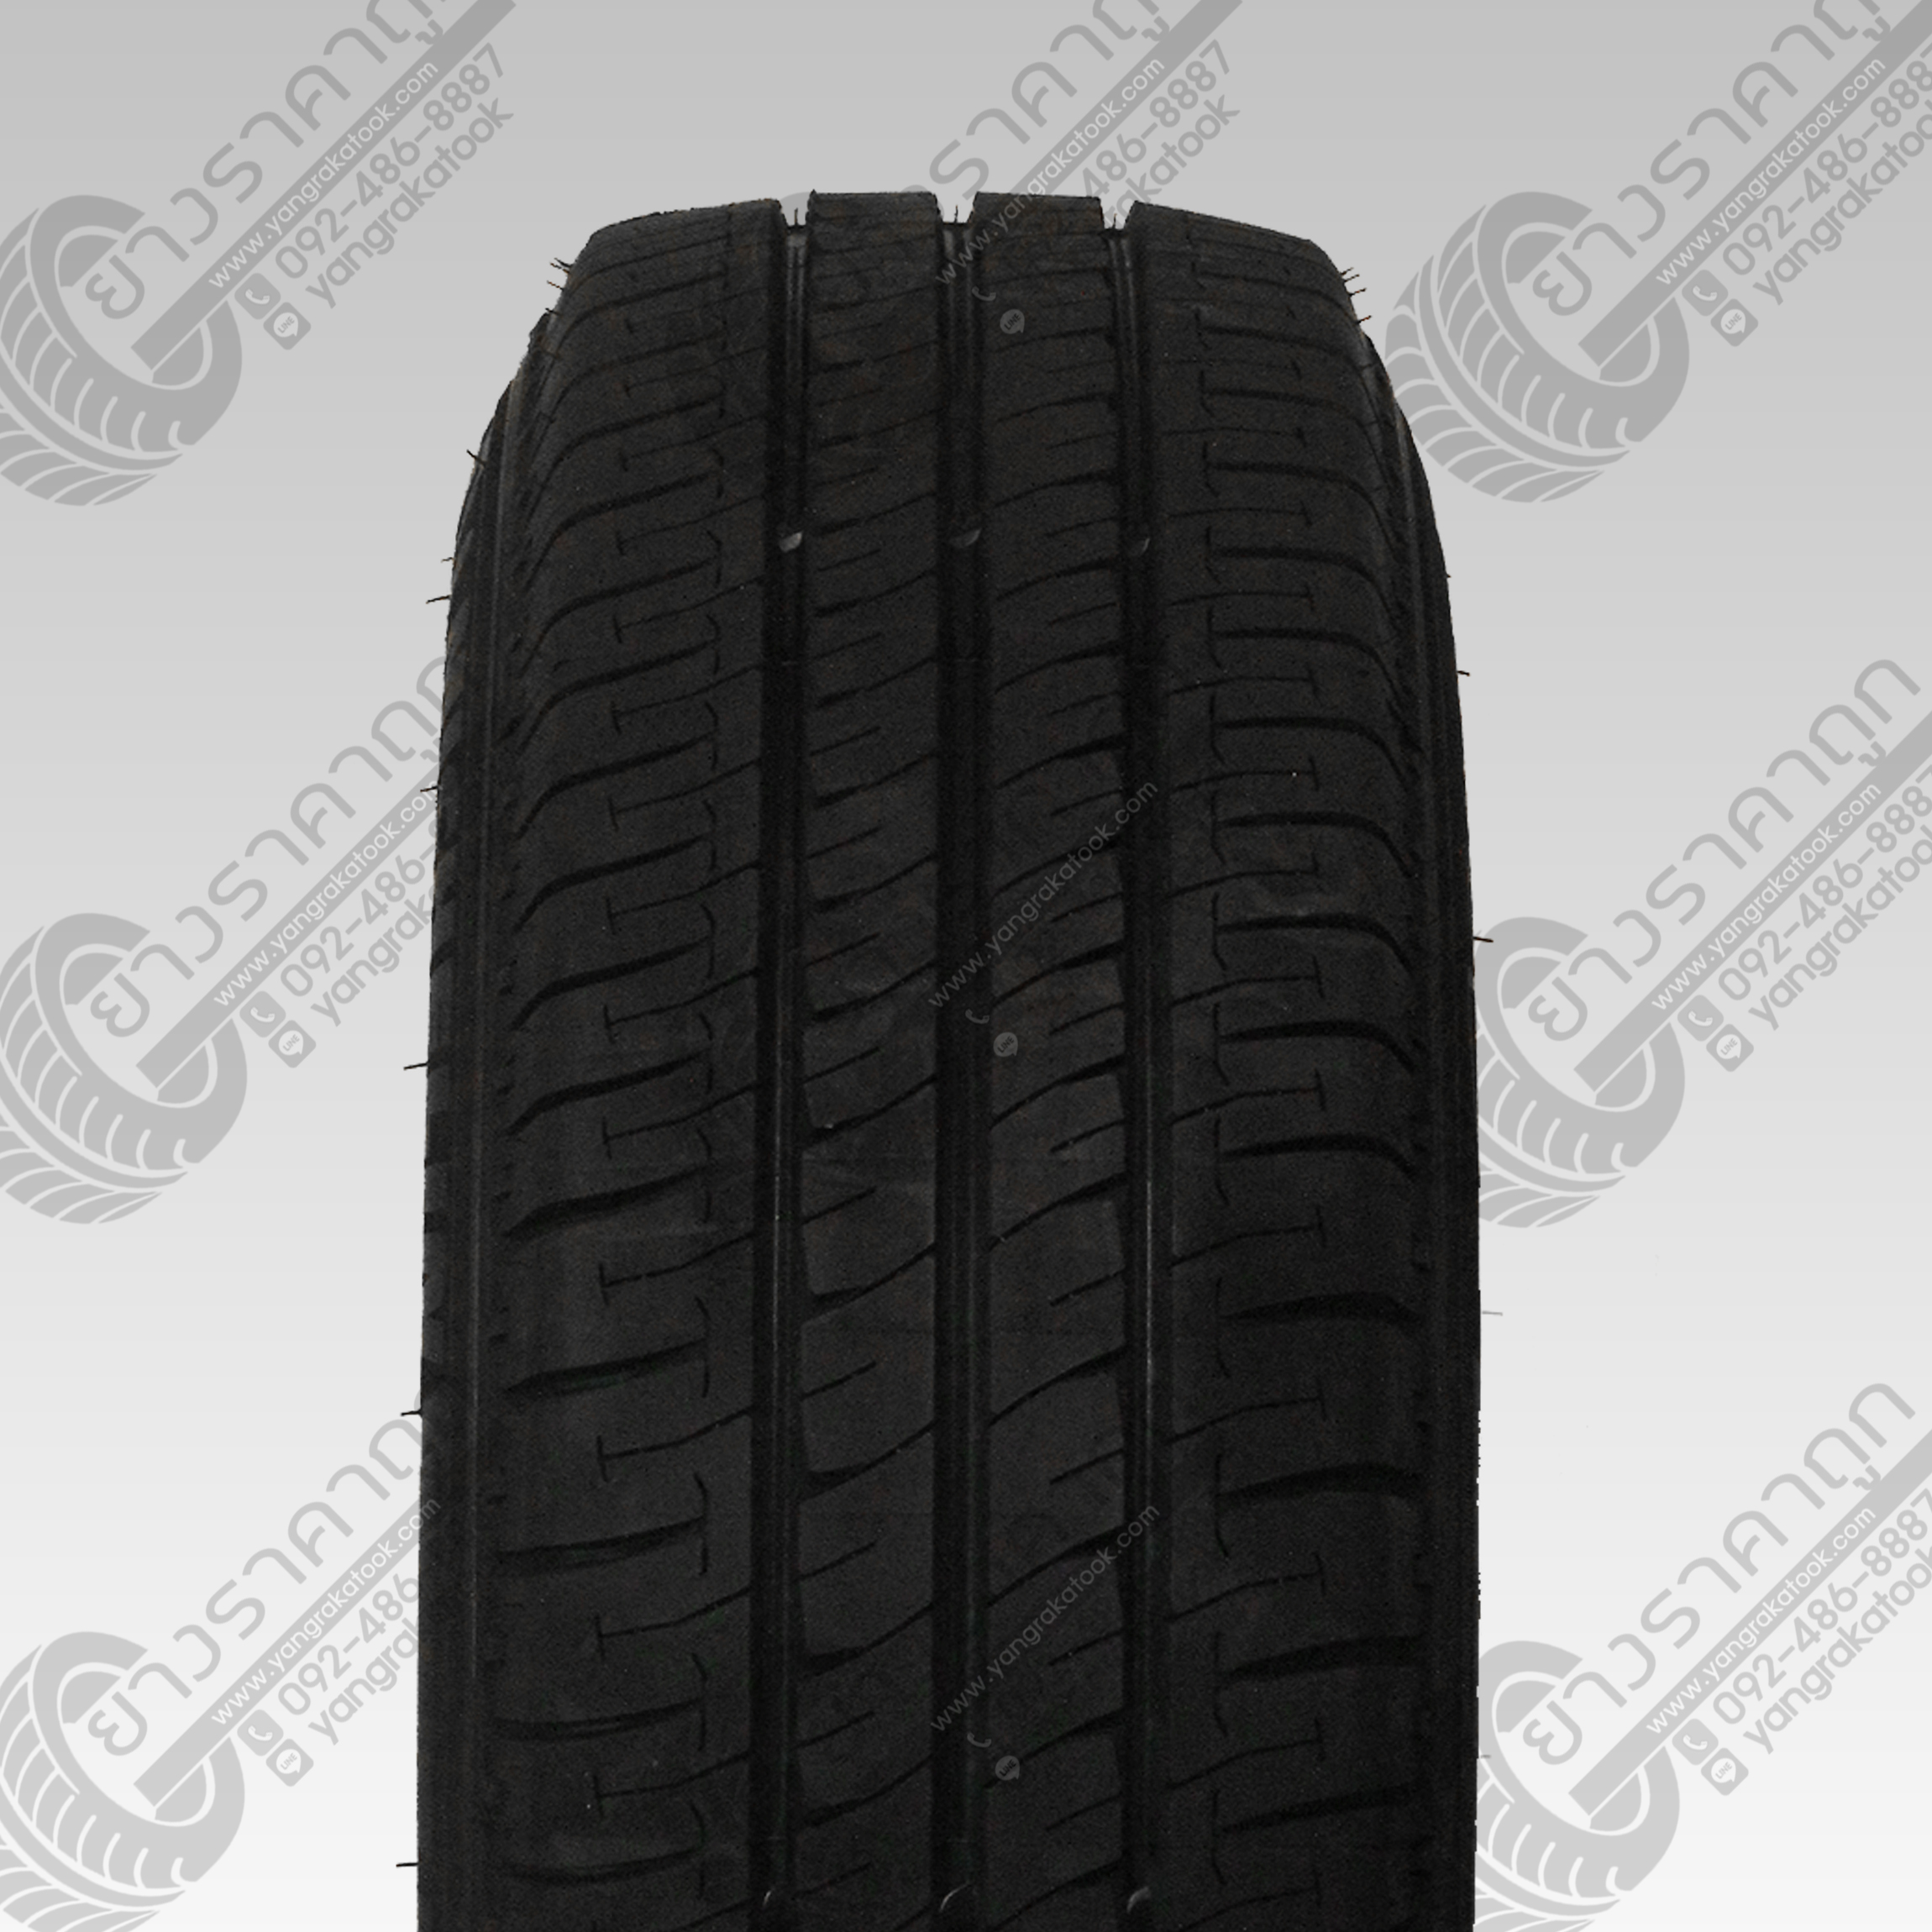 Michelin Agilis 215/65R16 ยางใหม่ปี 17